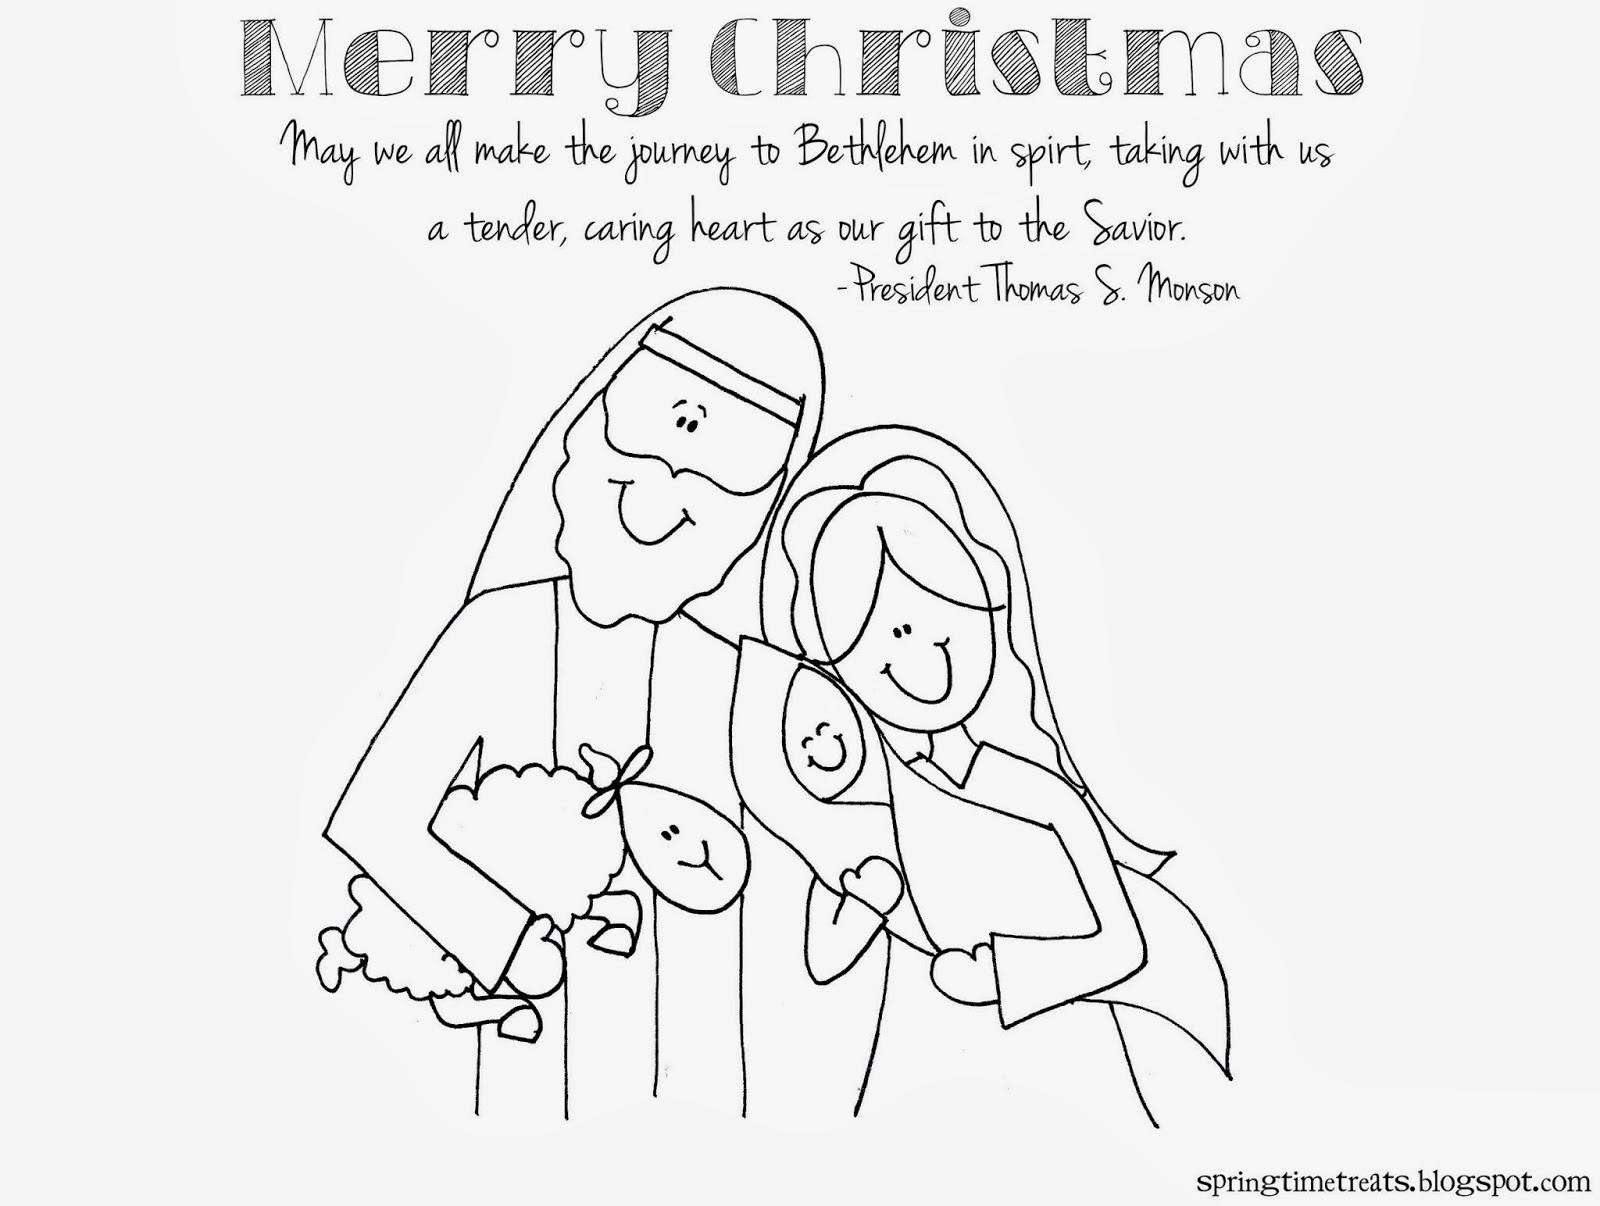 Merry christmas printable for Thomas s monson coloring page